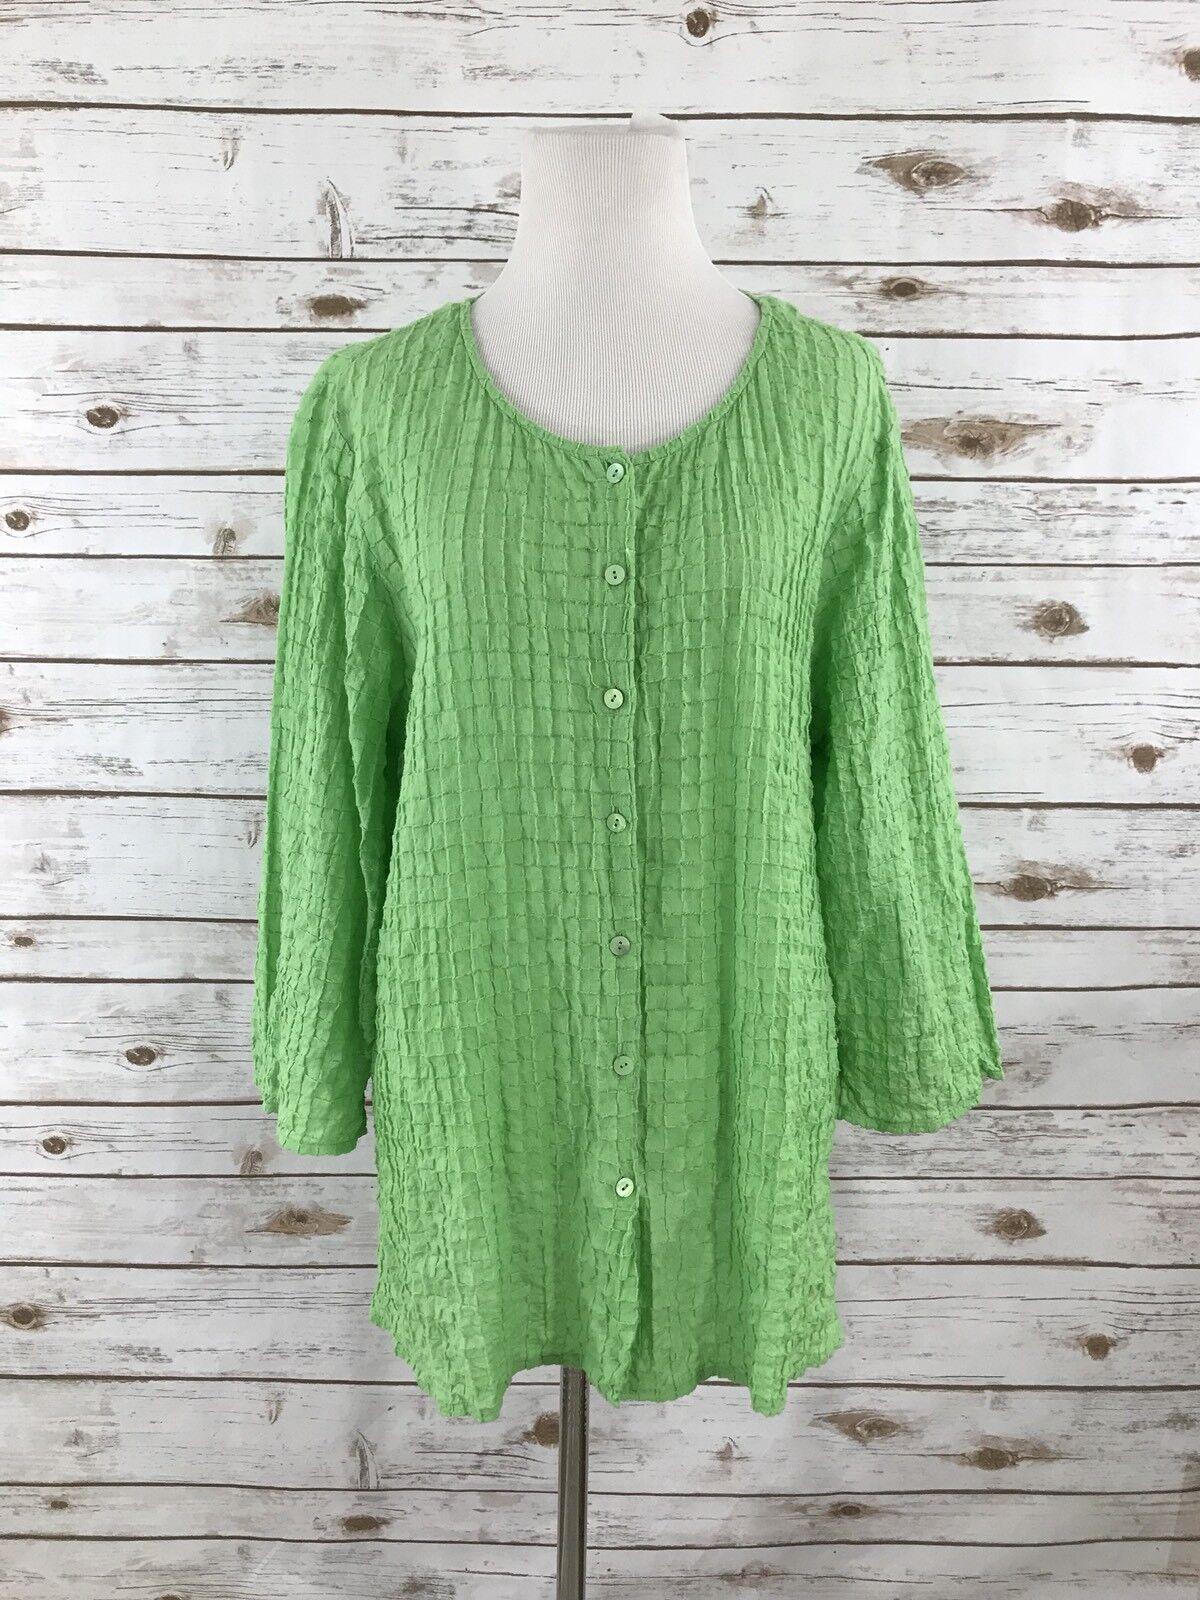 Eileen Fisher M Green Cotton Spandex Textured Open Weave Blouse